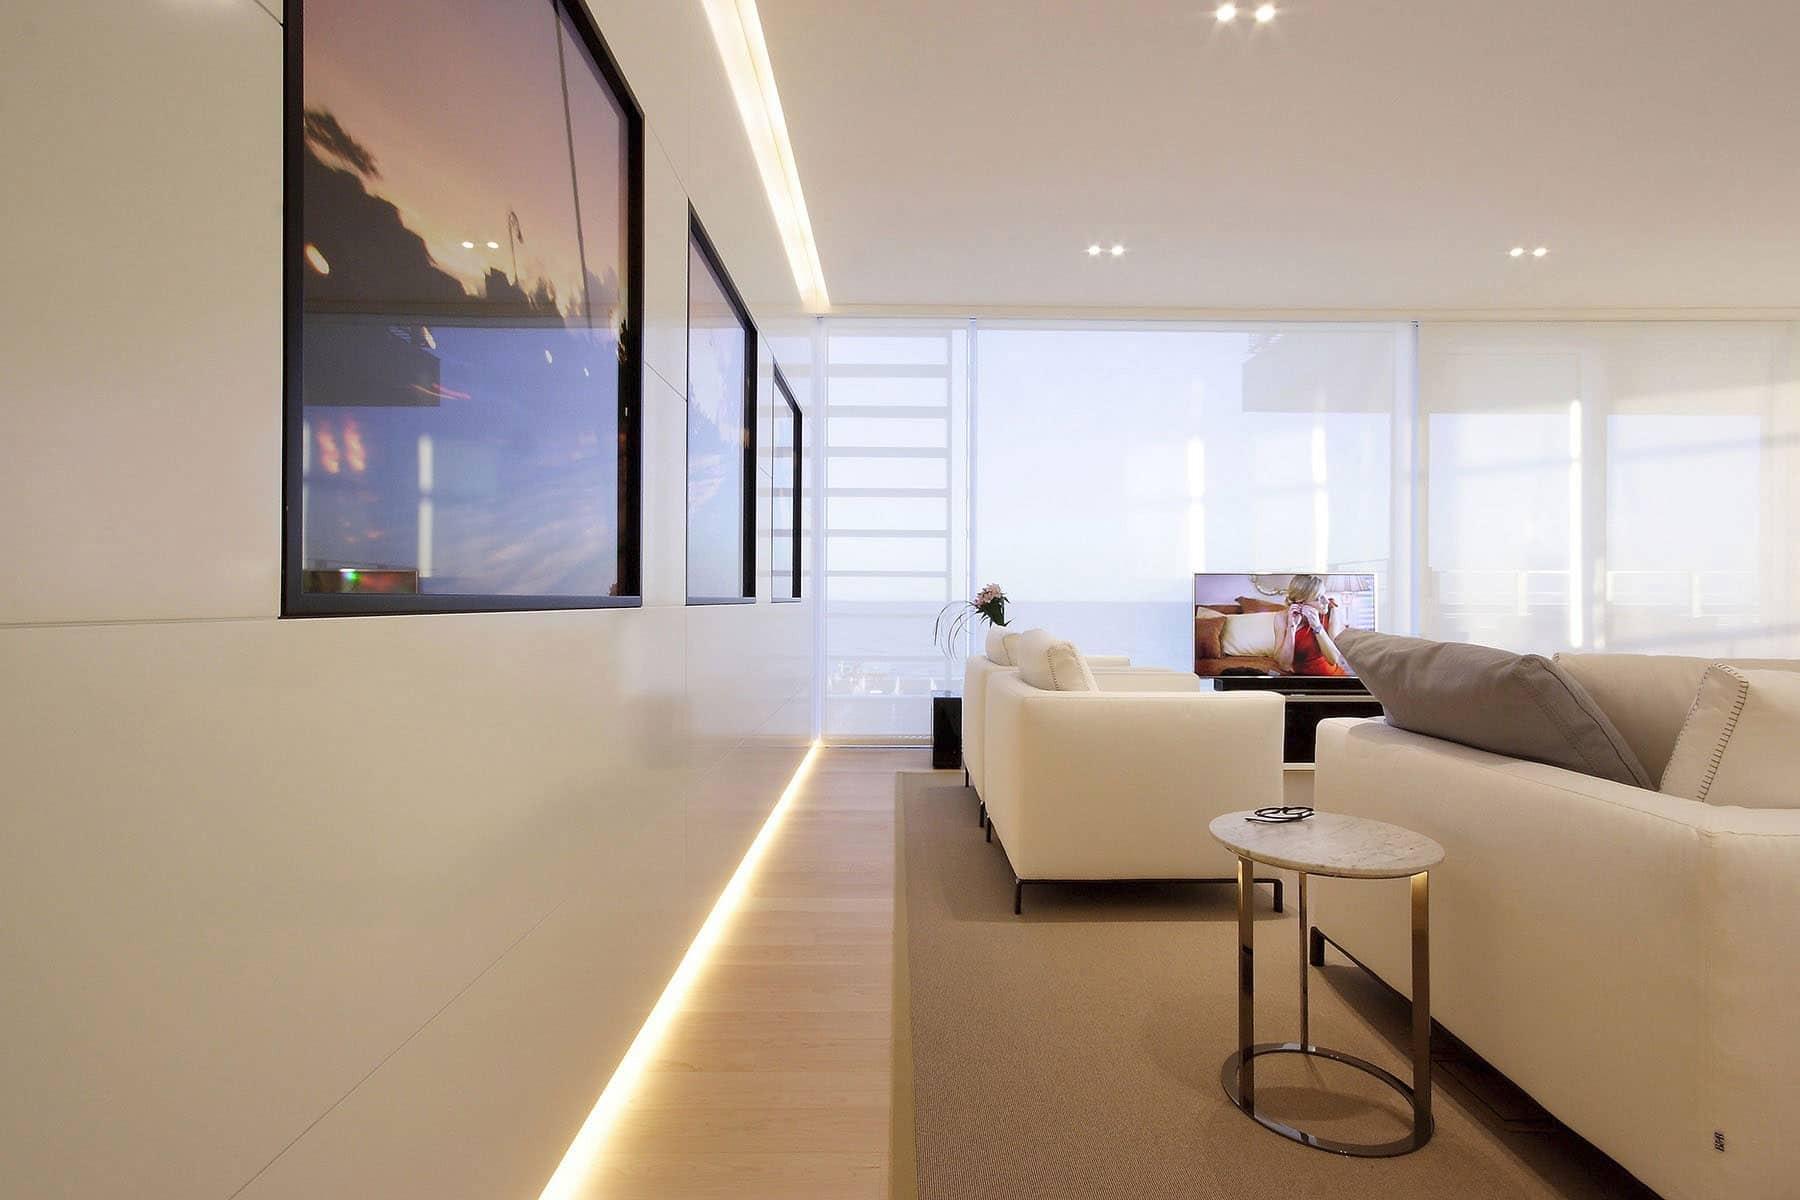 Plano departamento peque o dos dormitorios construye hogar for Distribucion departamentos modernos